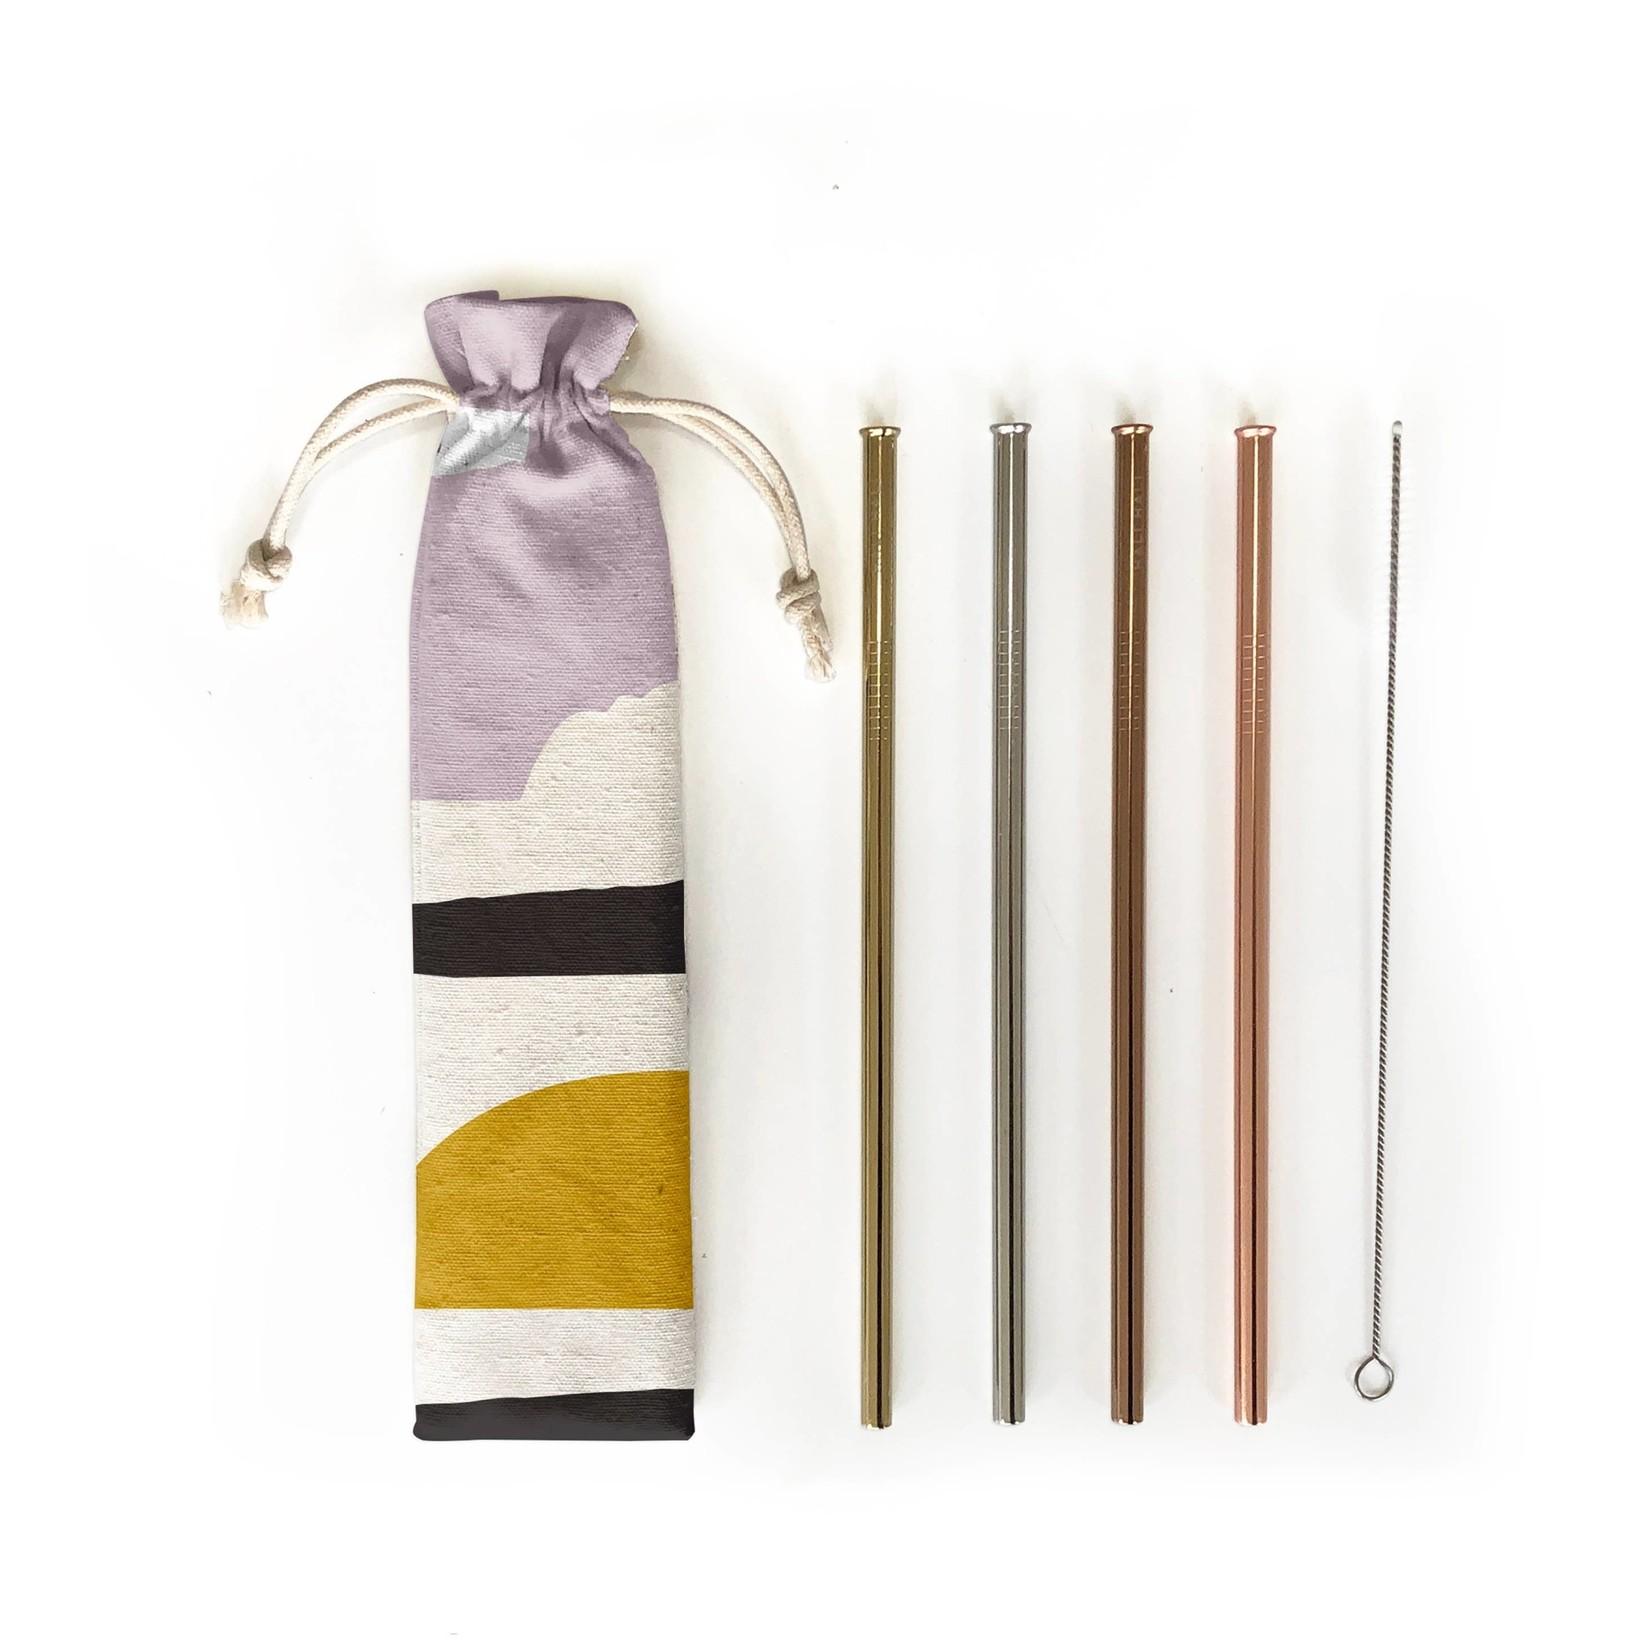 Hali Hali LLC Sunset 6 Piece Reusable Straw Set